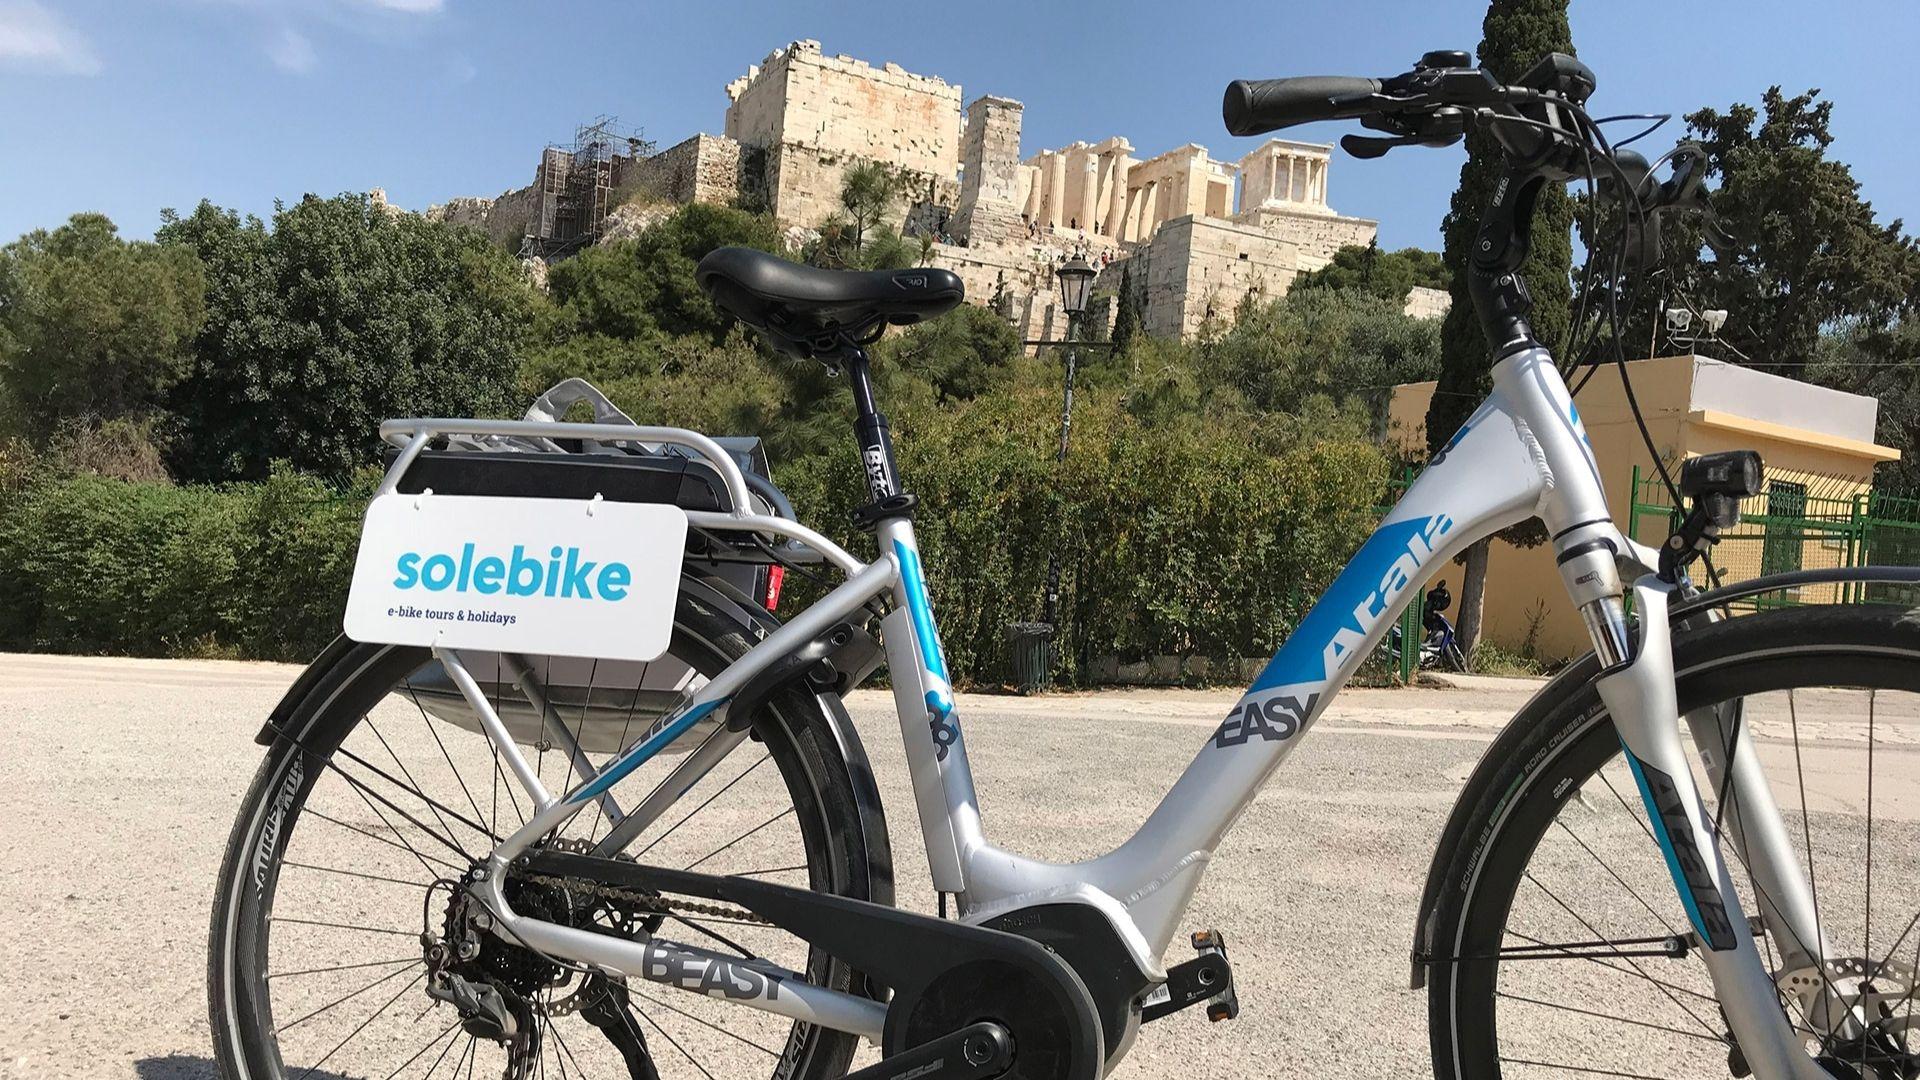 Tours in Athens - Historical Center e-bike Tour